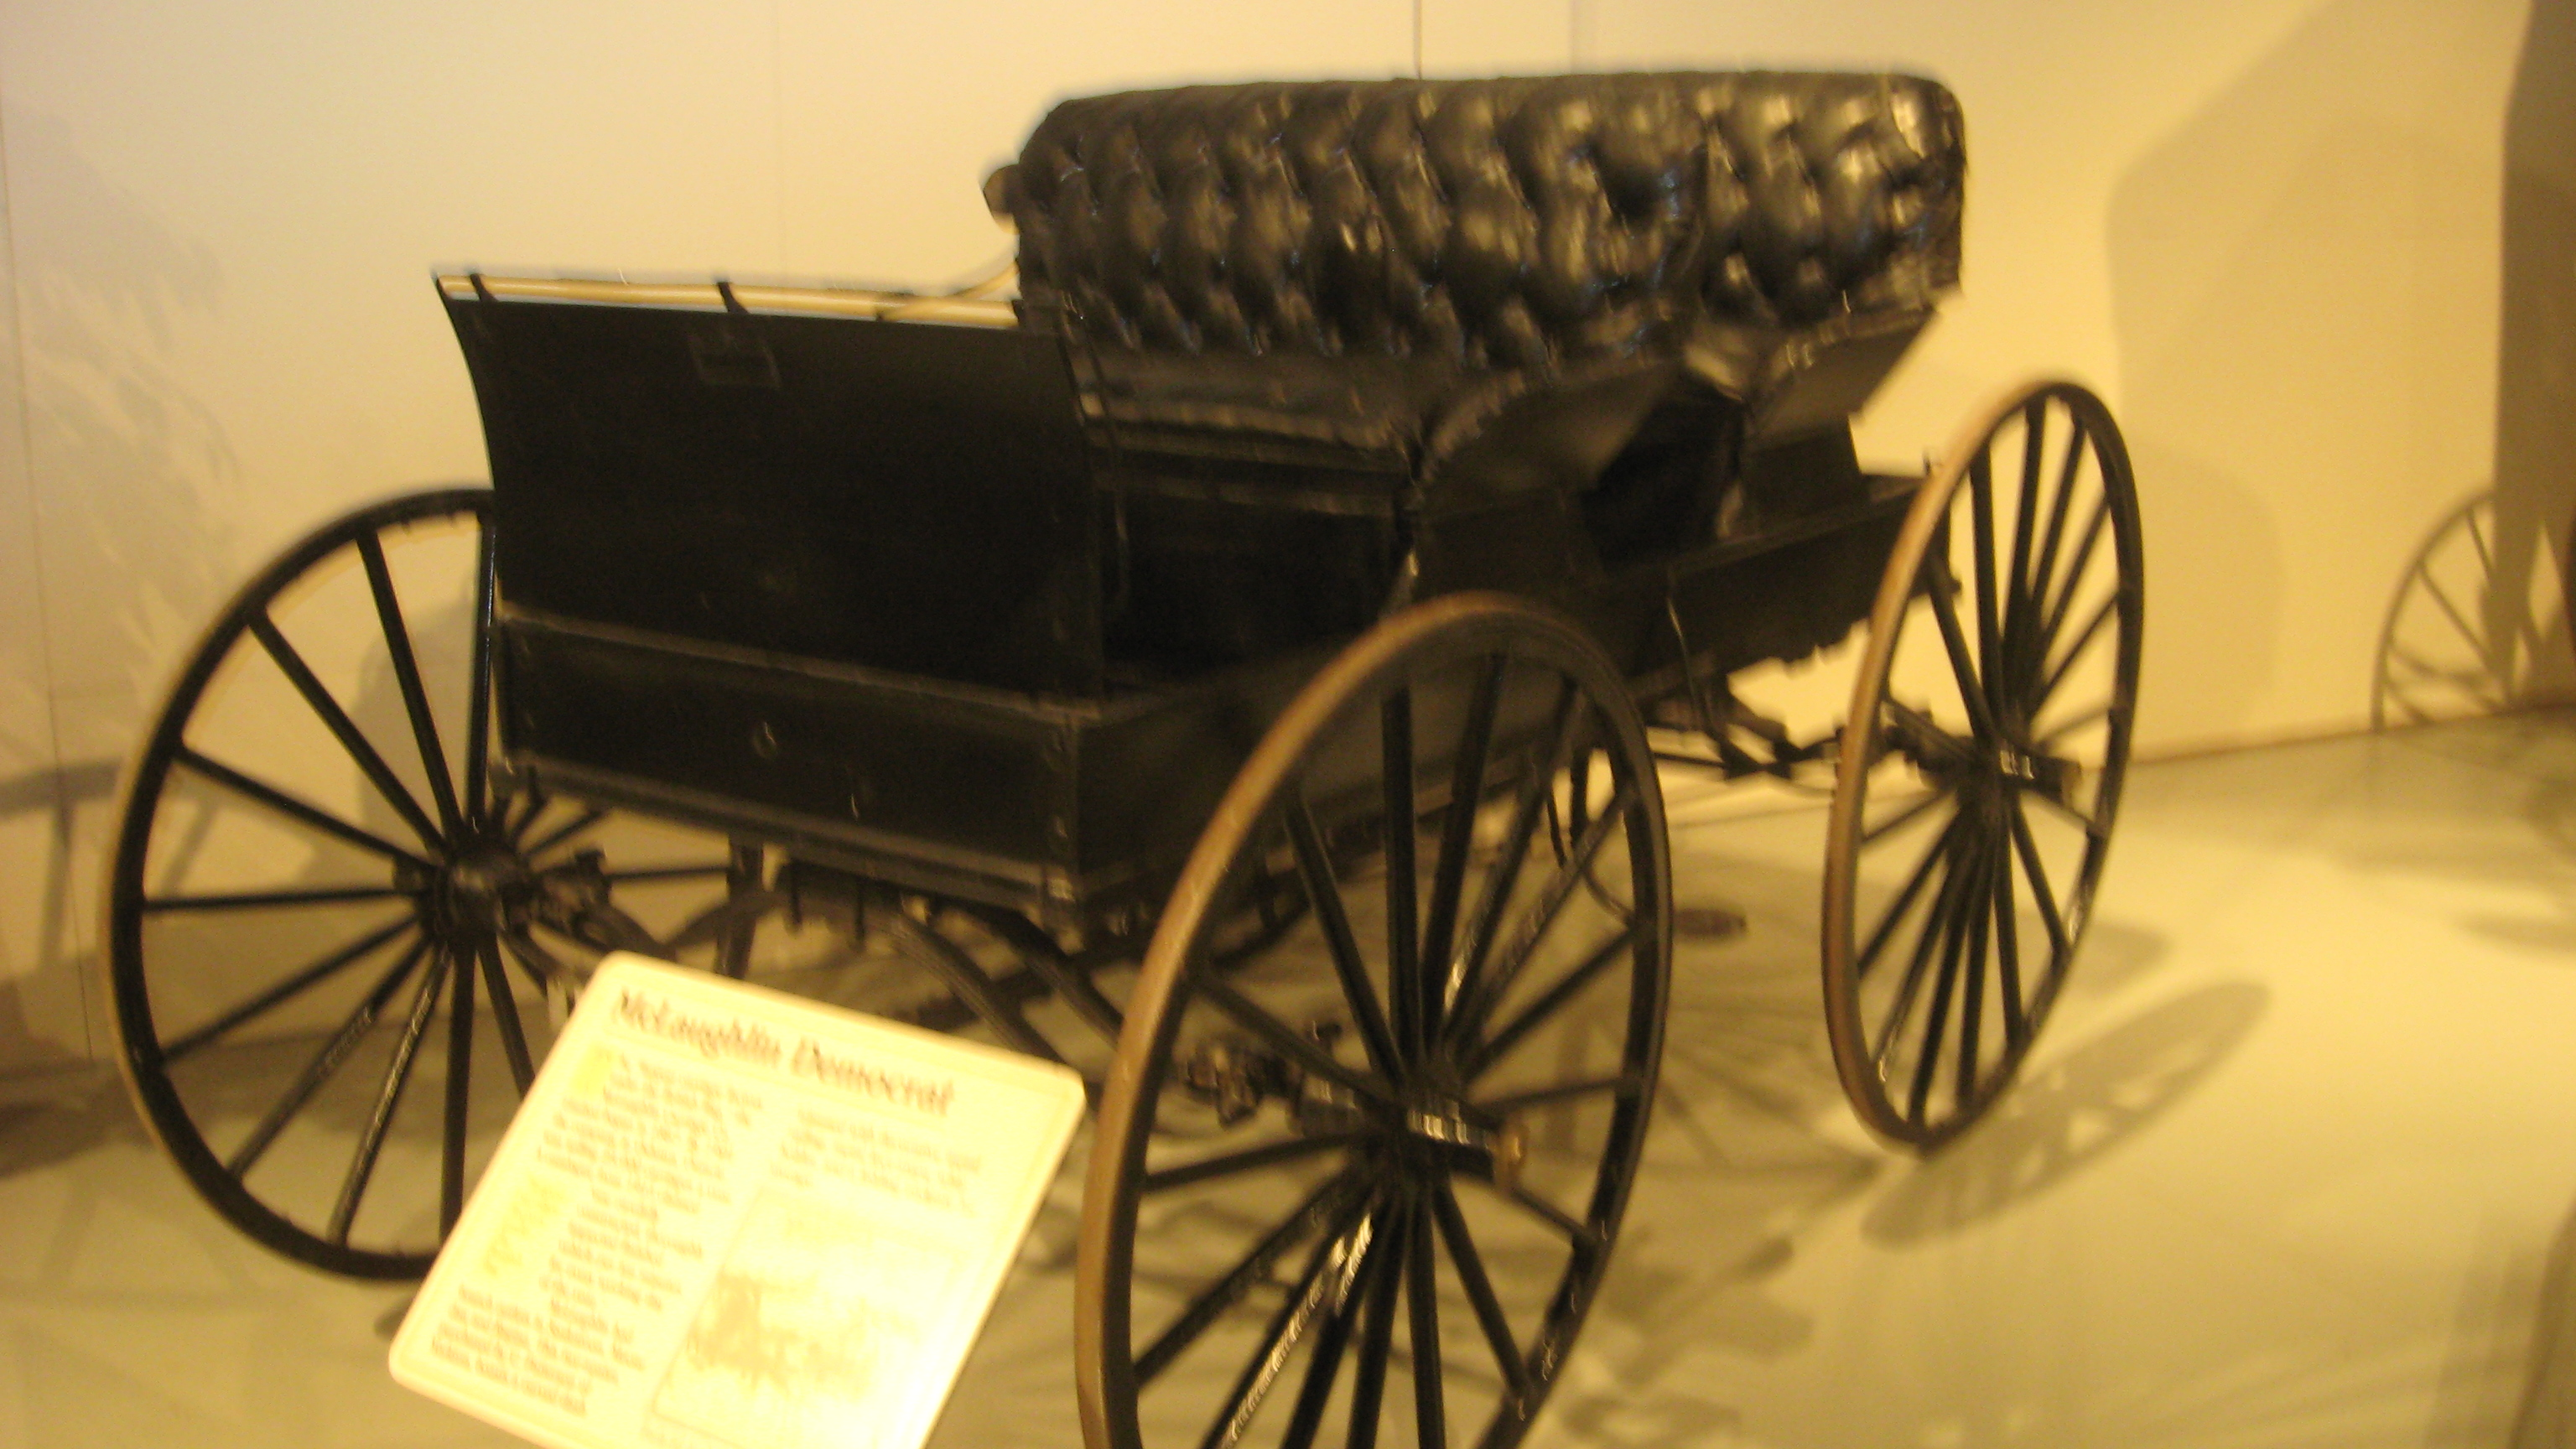 Mclaughlin Automobile Wiki Everipedia